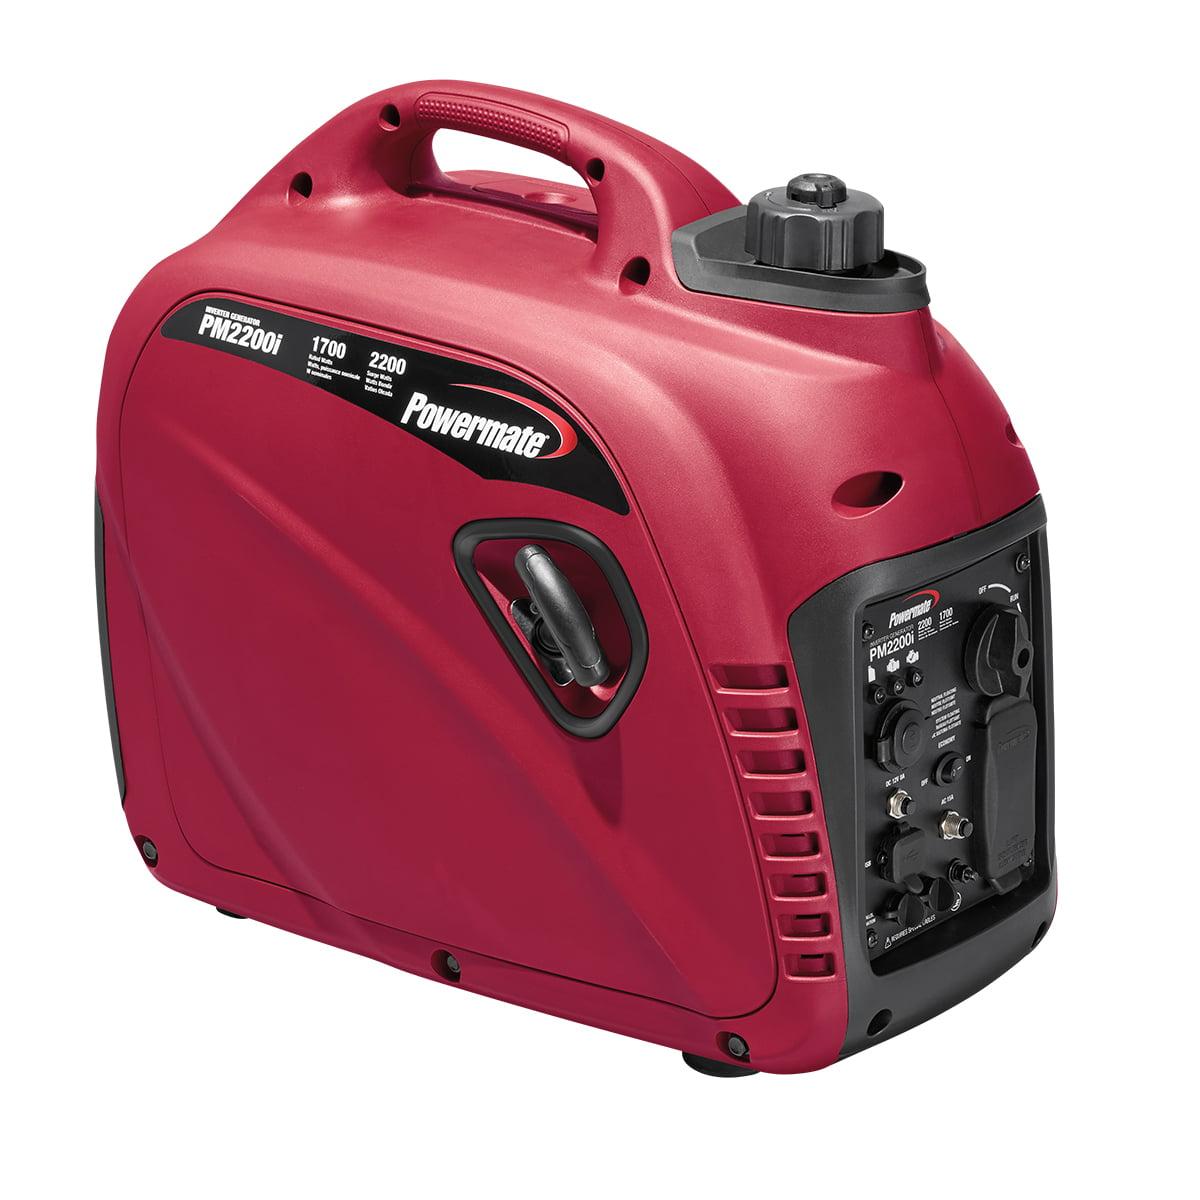 10000001790 2200 Watt Inverter Portable Generator, 50 State CSA by Generac